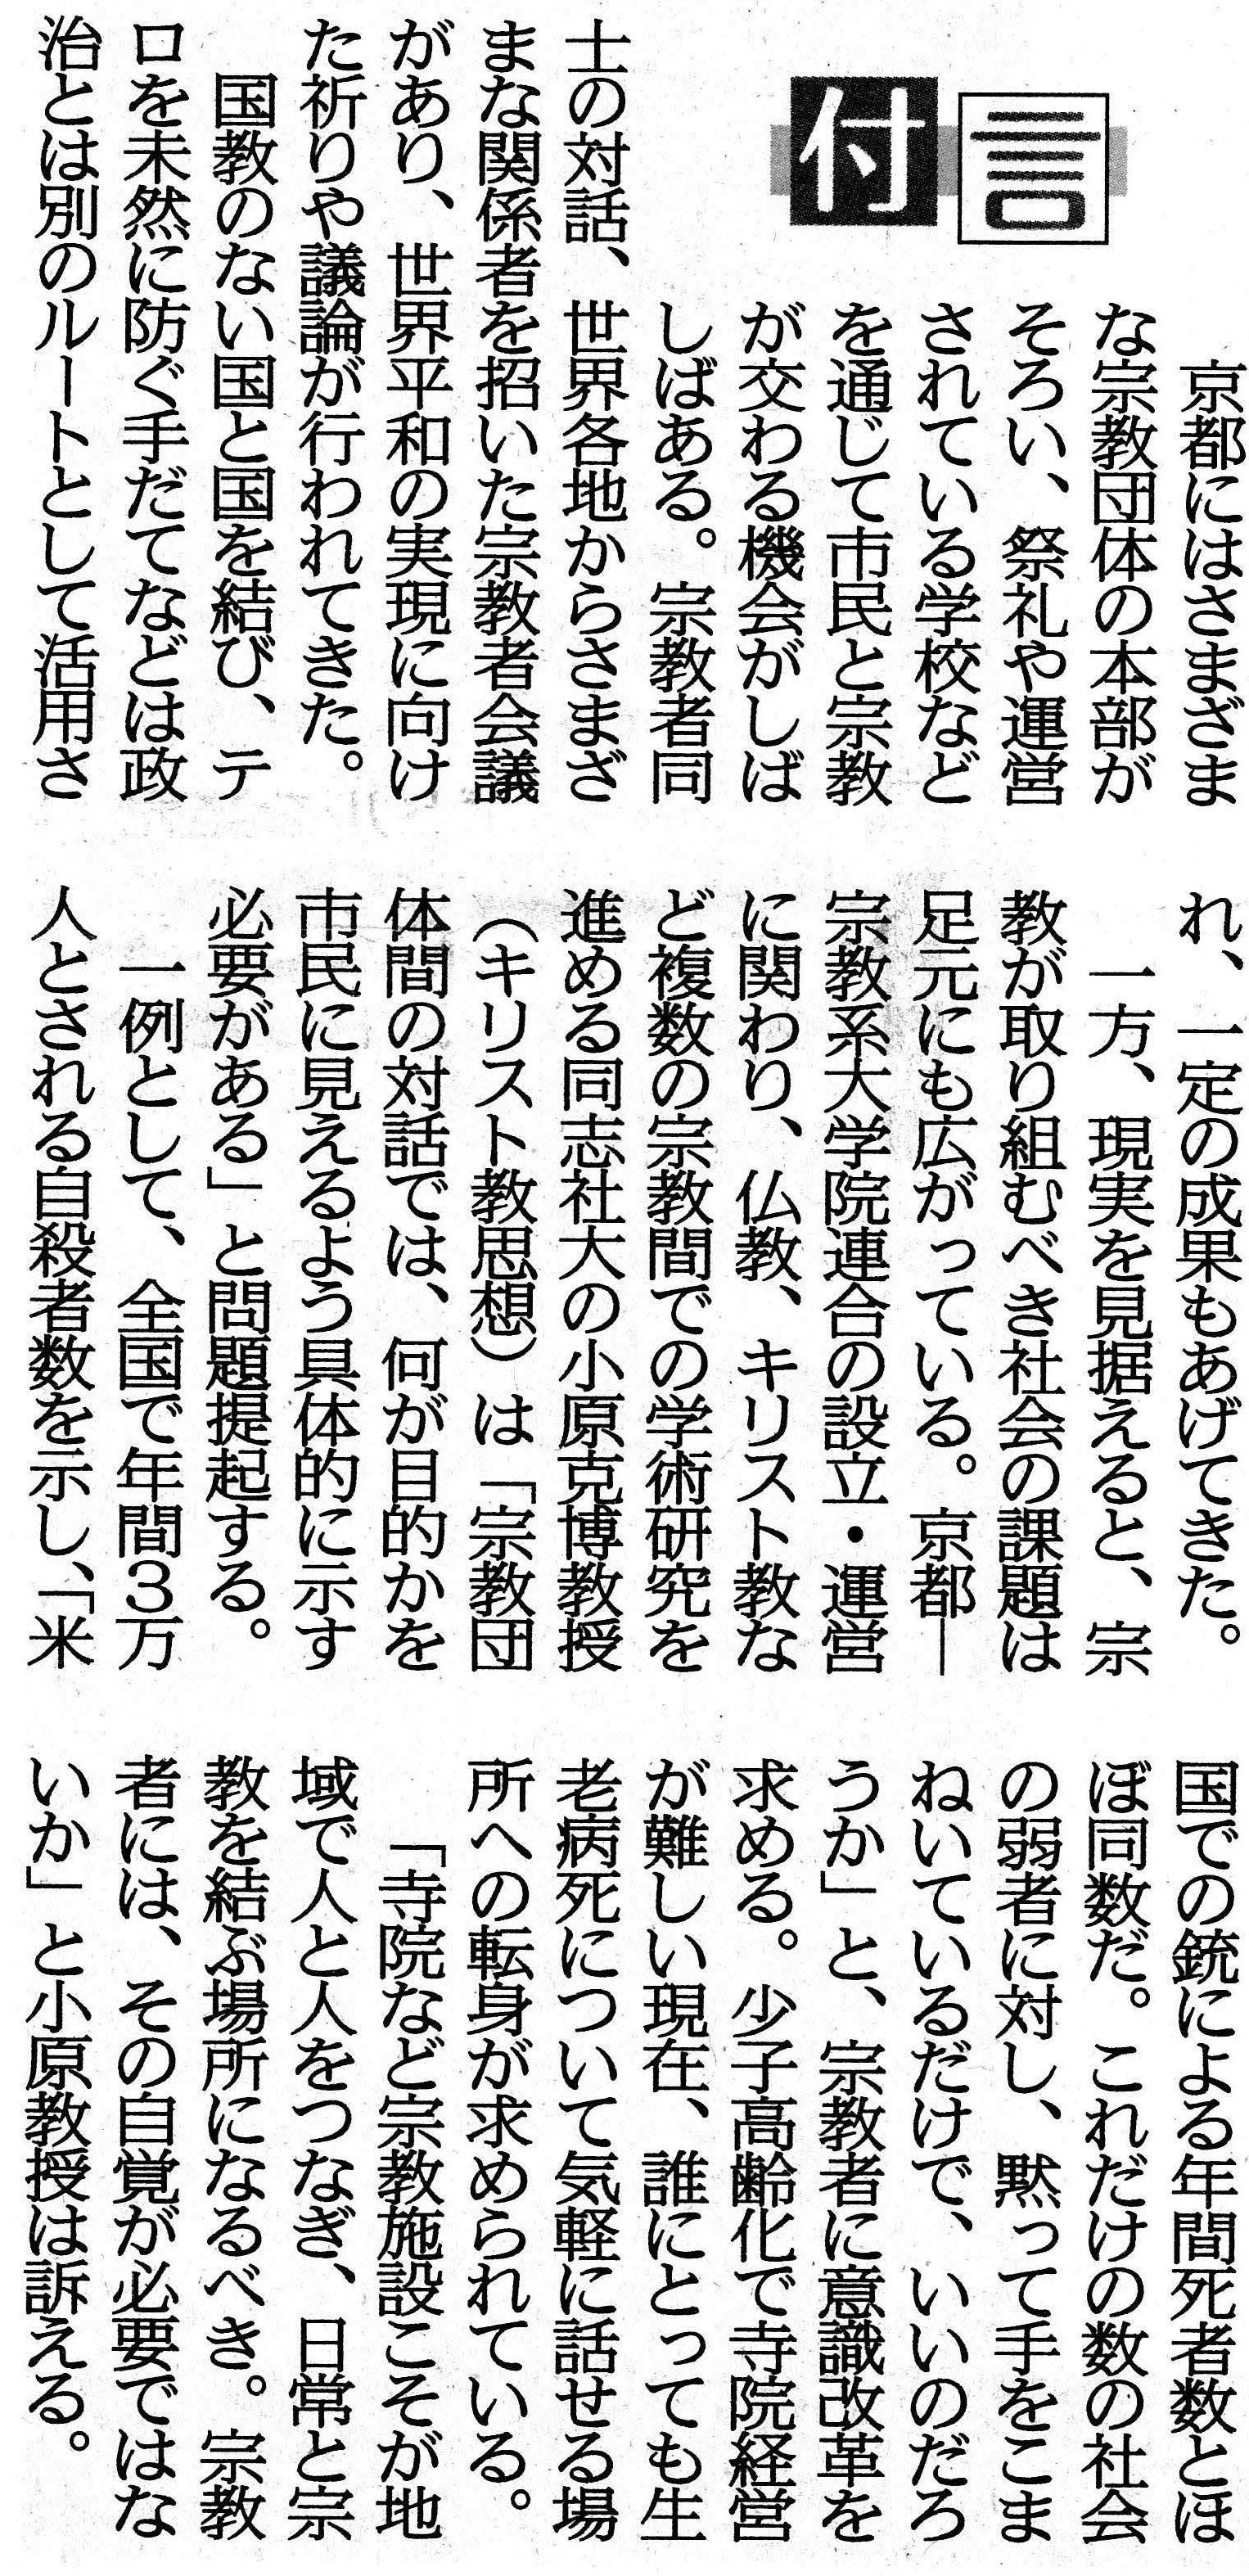 http://www.kohara.ac/essays/Kyoto20160703m.jpg